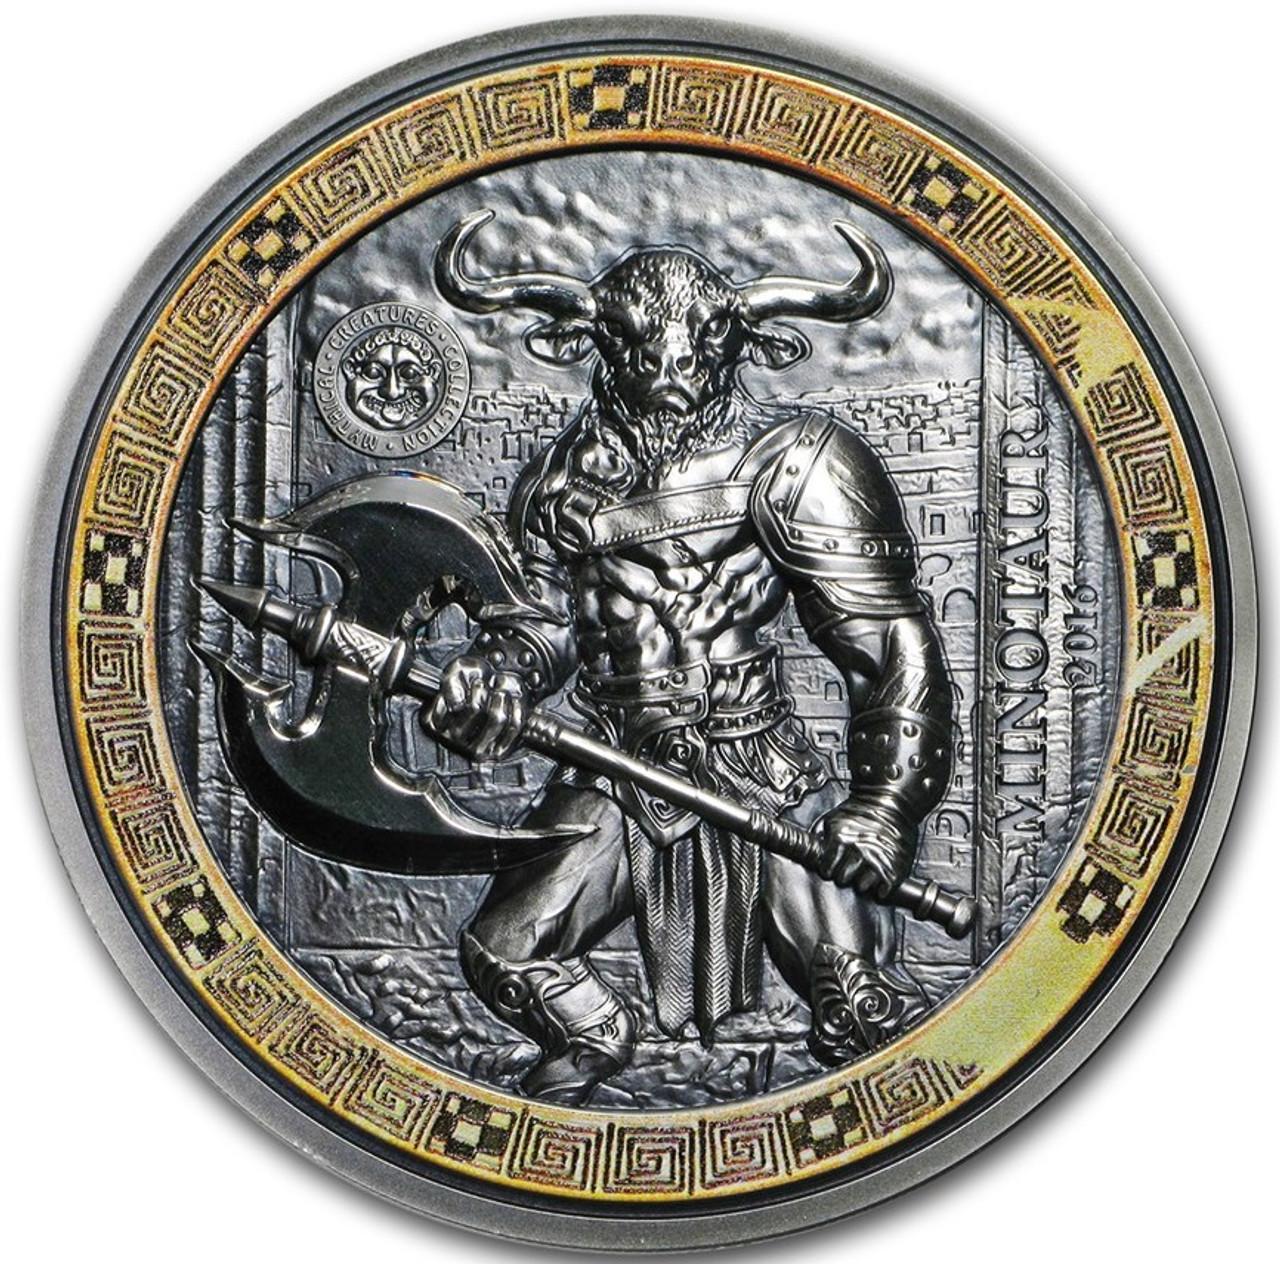 2016 2 Oz Silver $10 MINOTAUR Mythical Creatures Coin Palau.